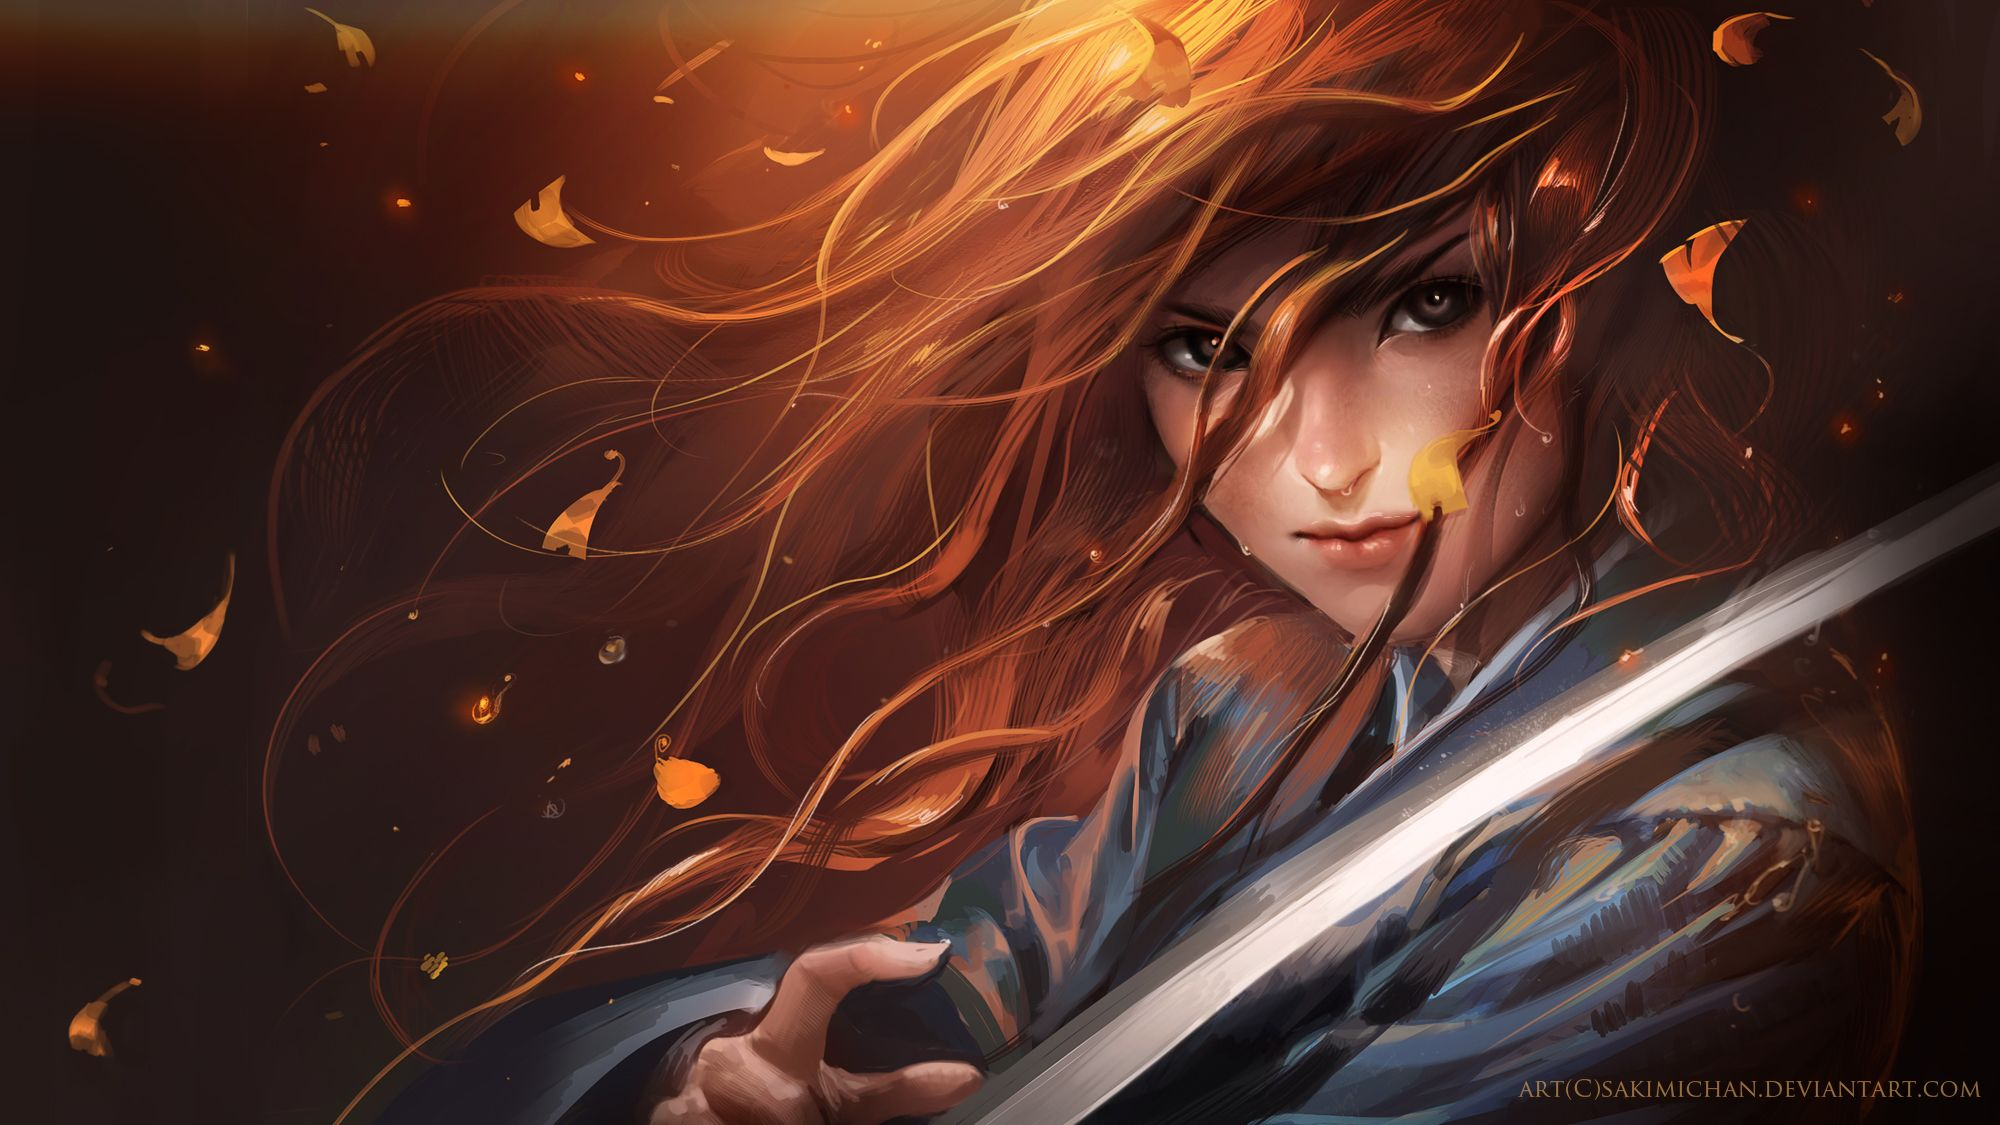 Red Haired Samurai by sakimichan.deviantart.com on @deviantART